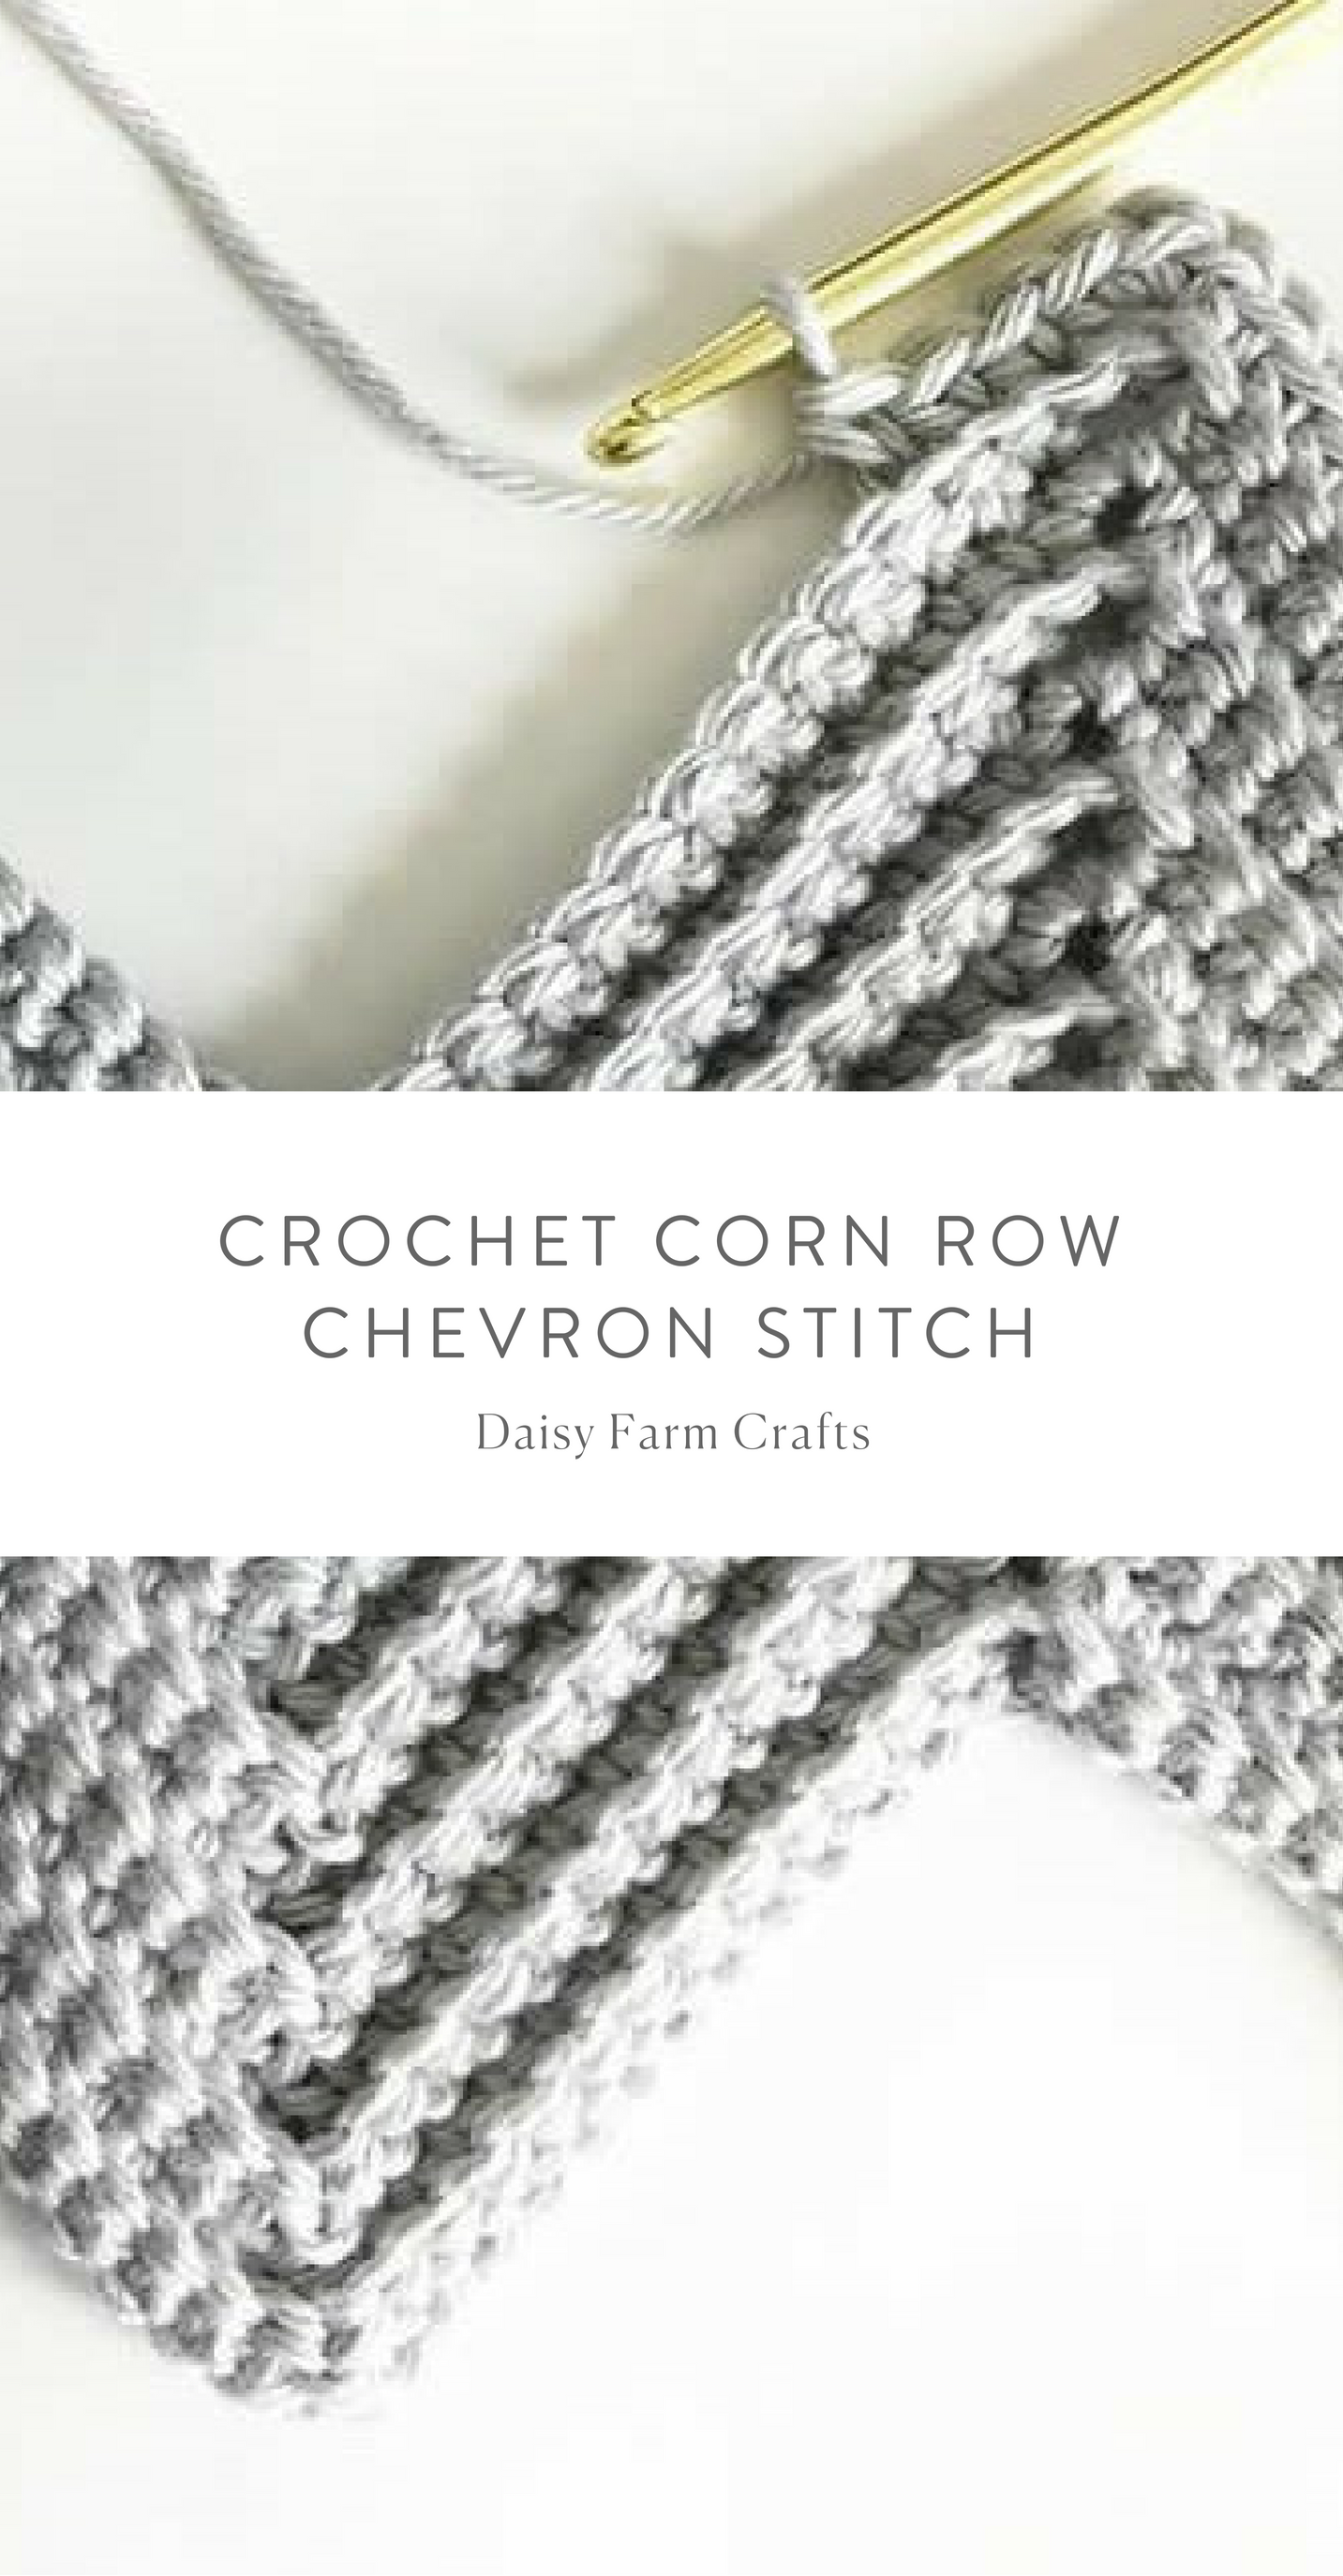 Crochet Corn Row Chevron Stitch | Yarn: crochet & knitting etc ...